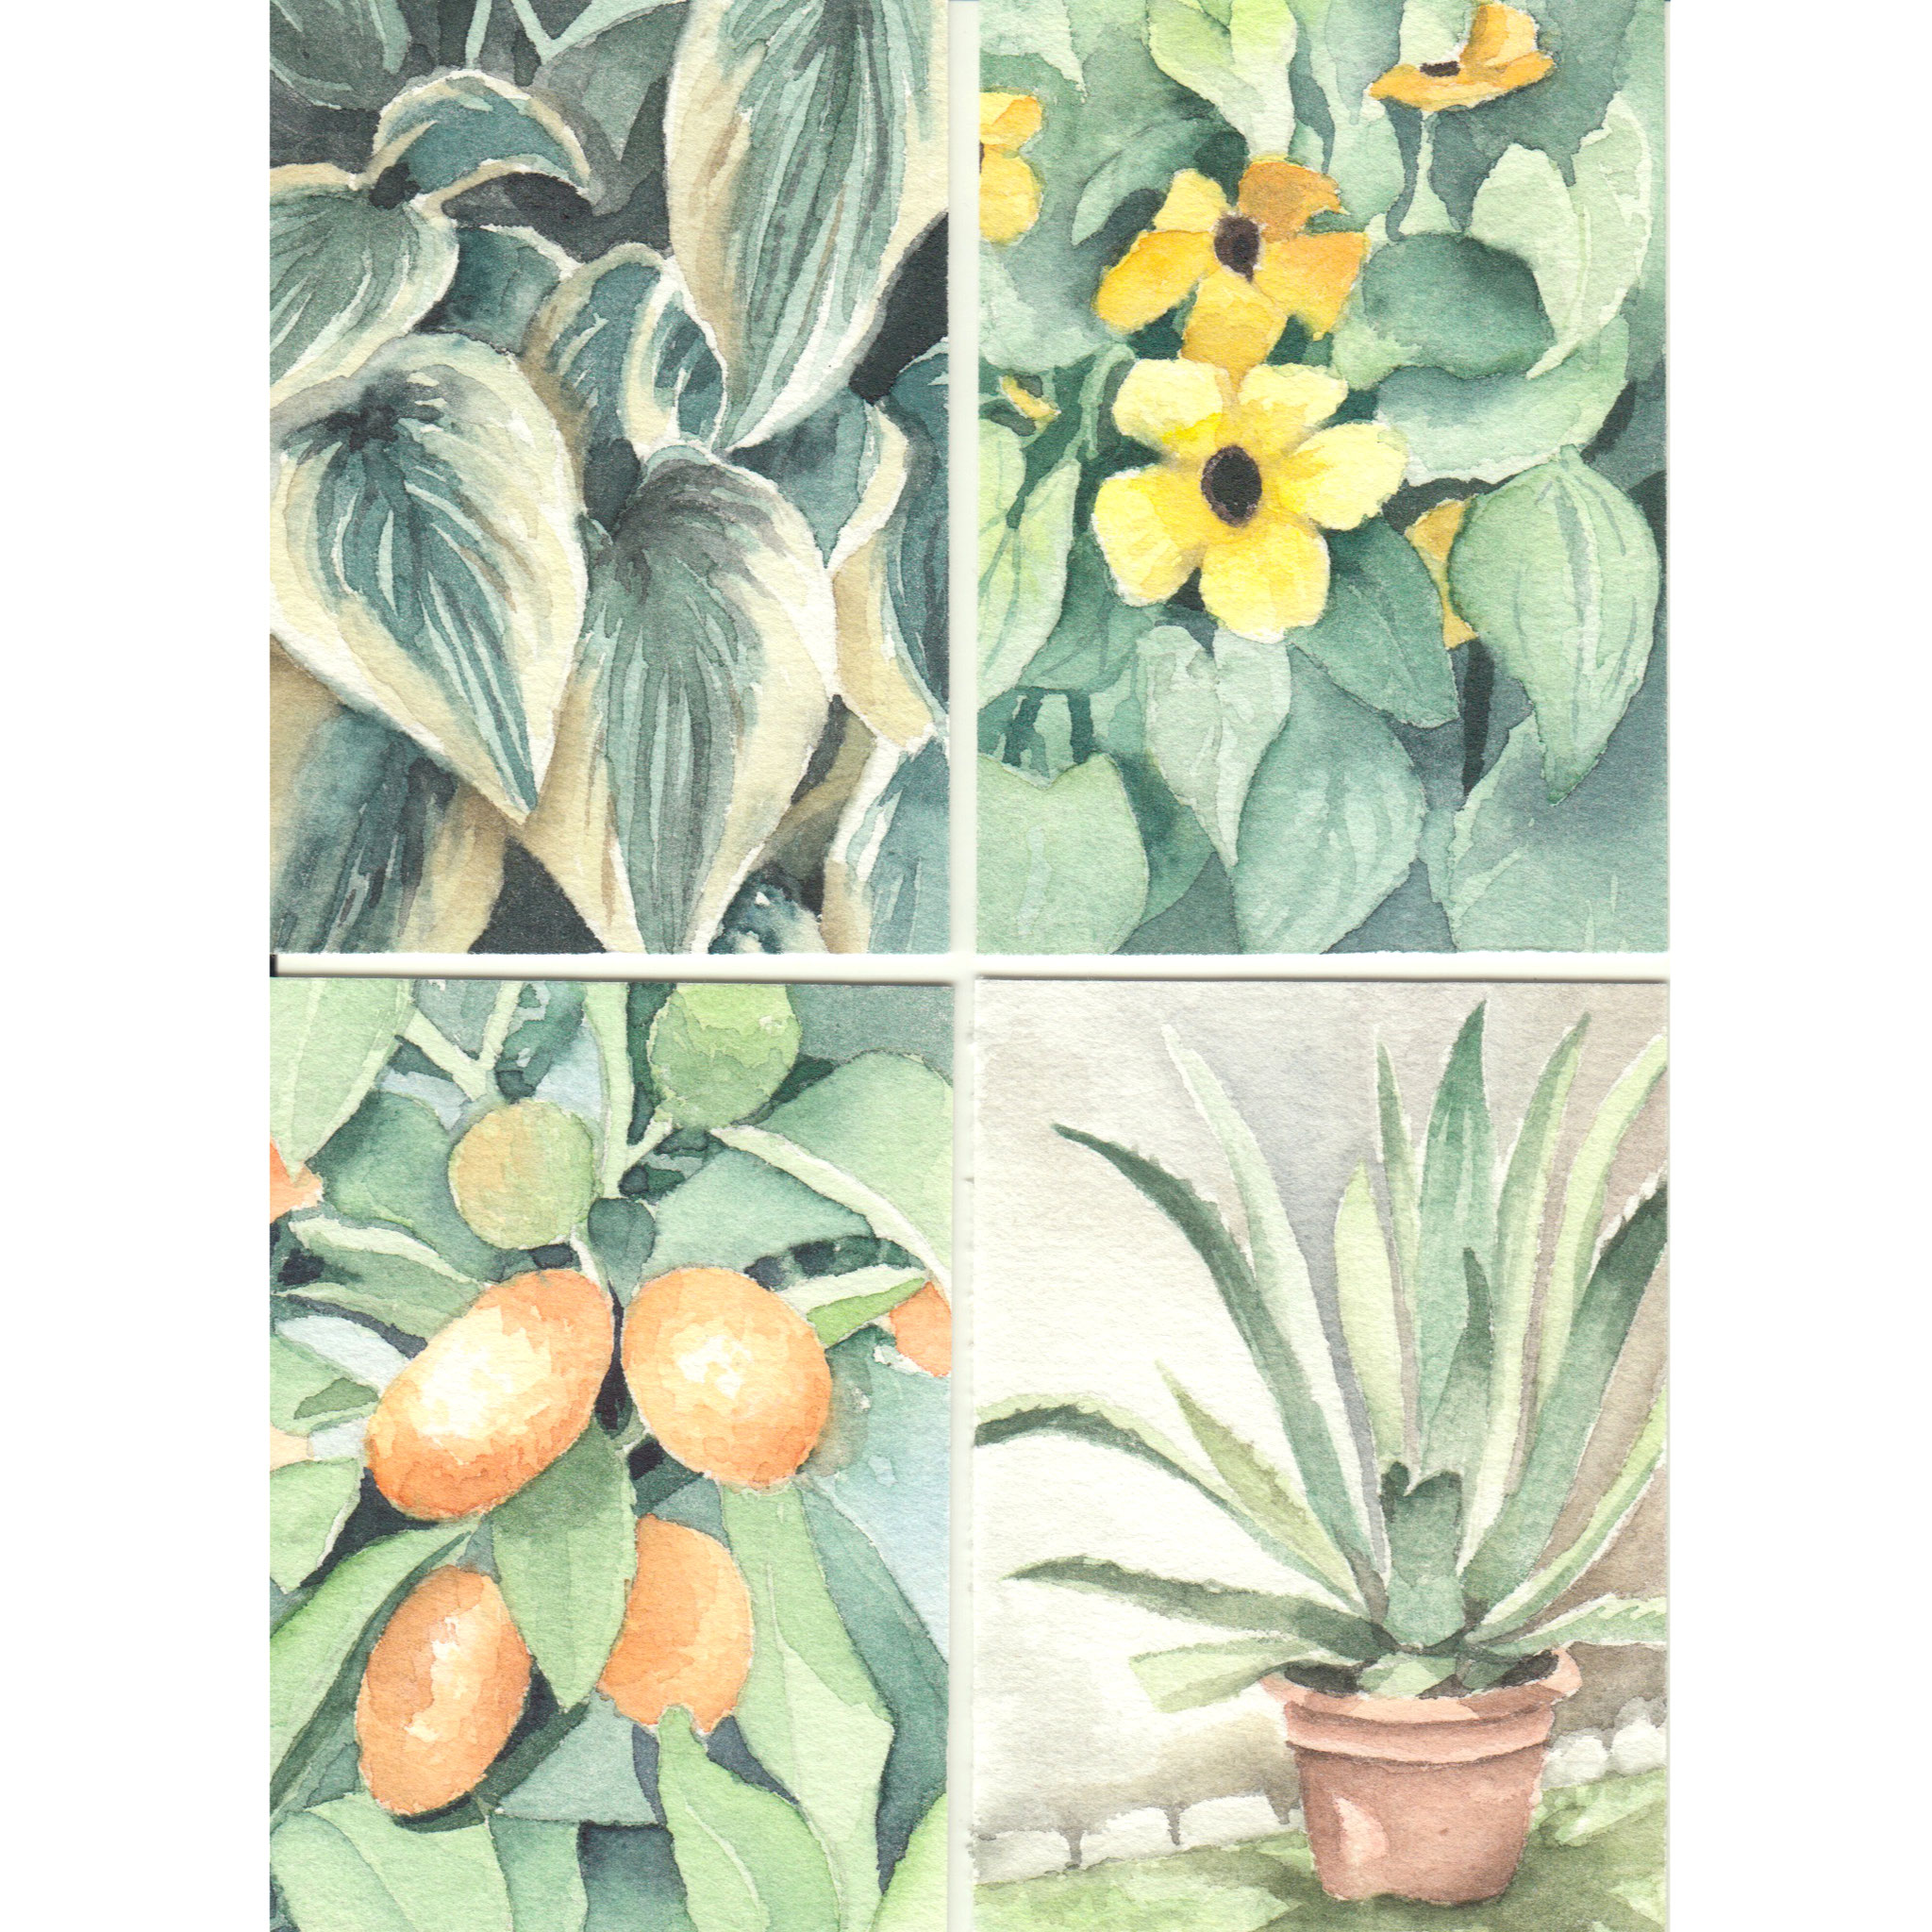 ATC: Pflanzen auf dem Balkon (Skizzenpapier 6,4x8,9cm)